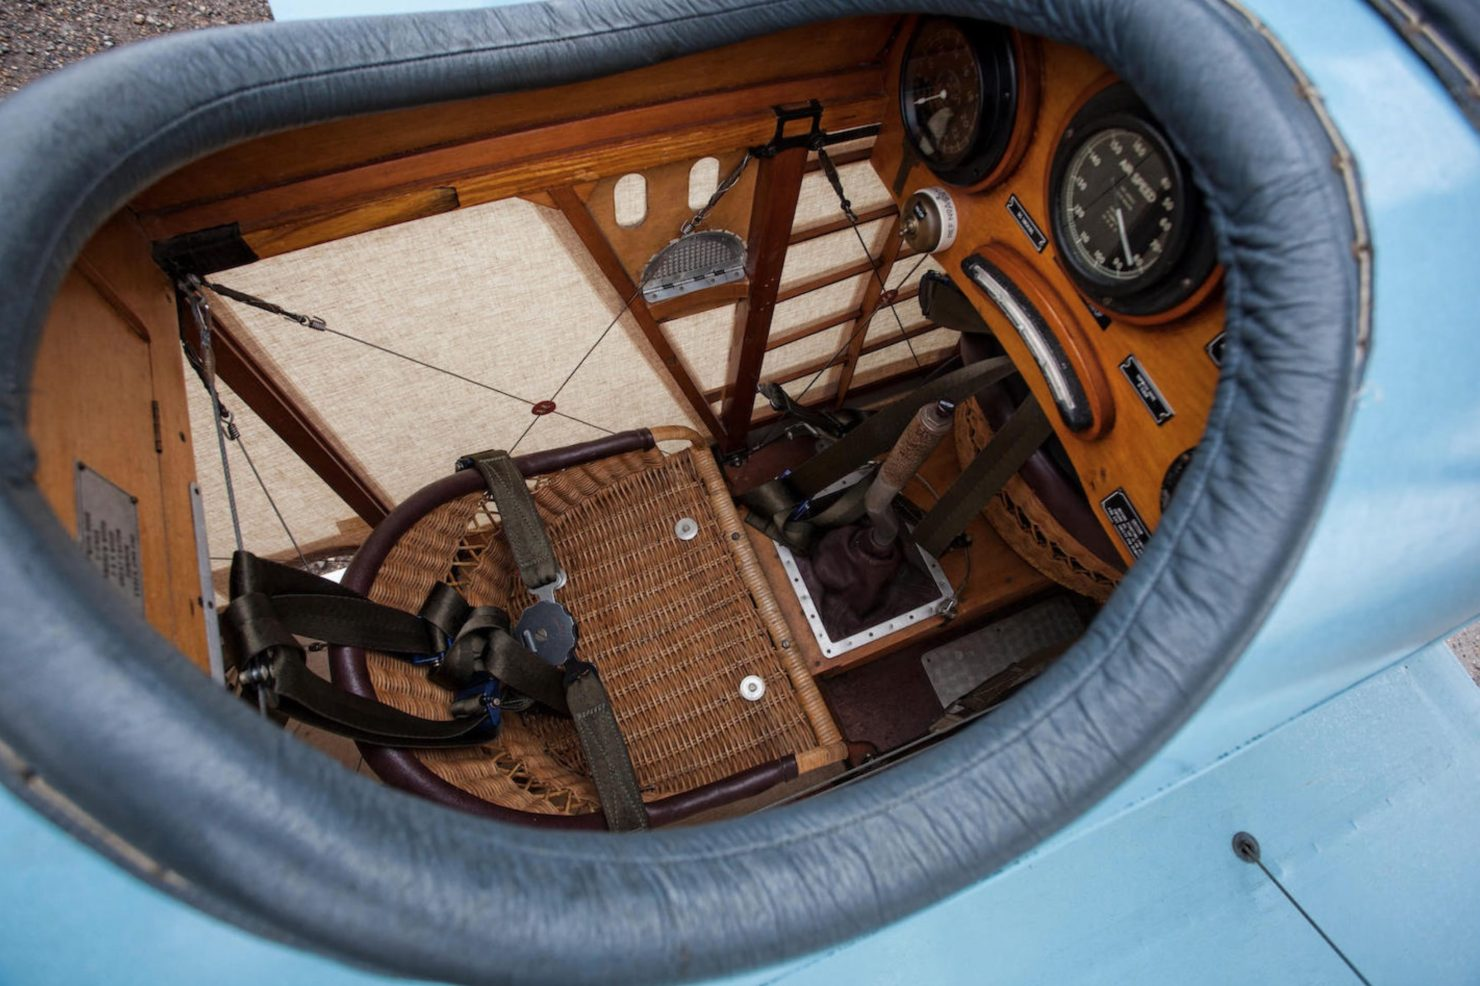 Sopwith Dove 1 1480x986 - Sopwith Dove Biplane